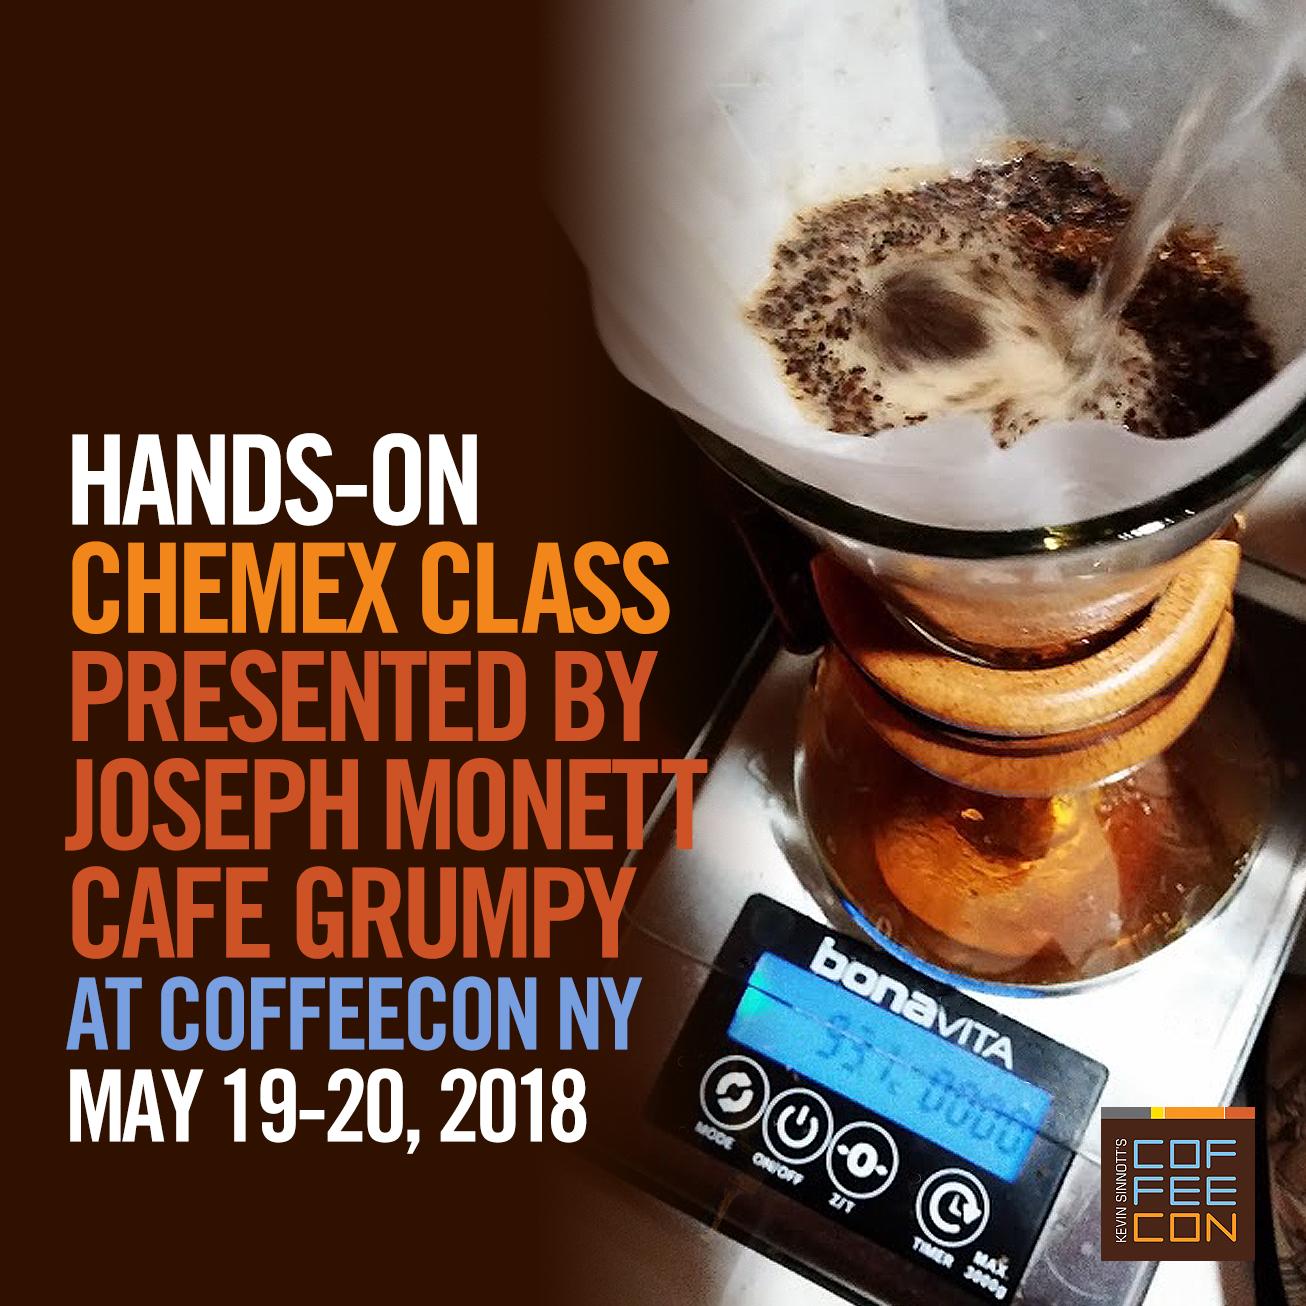 Hands-on Chemex class presented by Joseph Monett